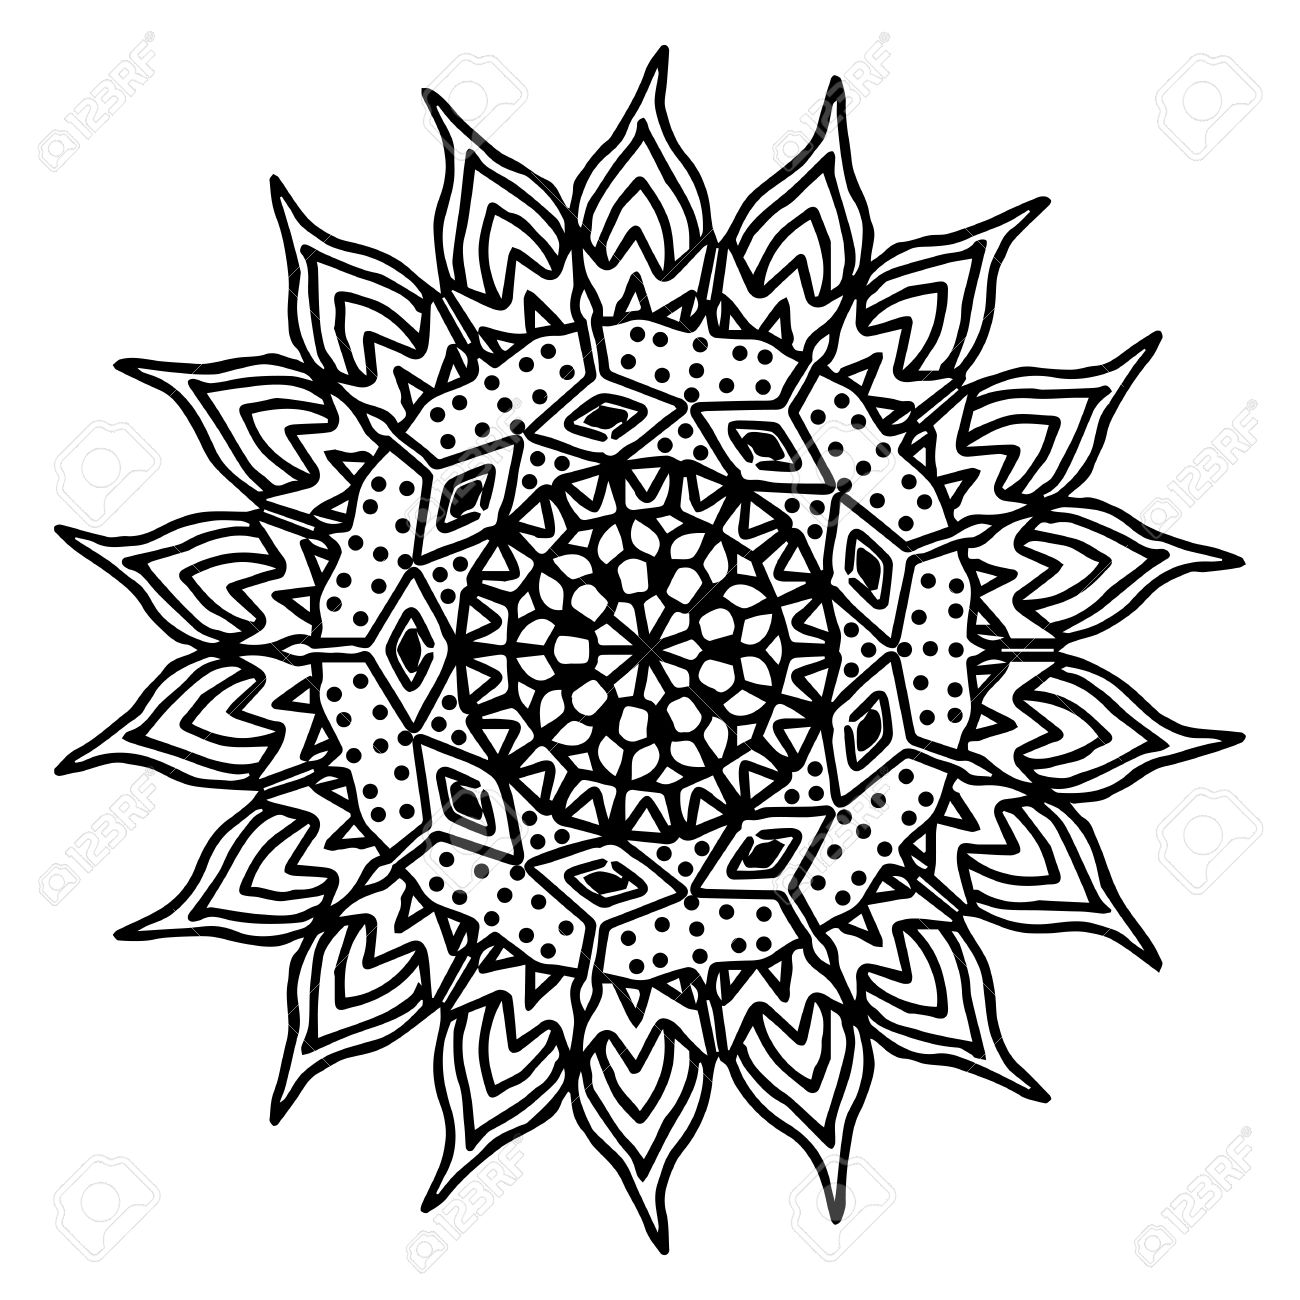 1300x1300 Sun Hand Drawing Doodling Mandala Coloring Page Isolated Royalty